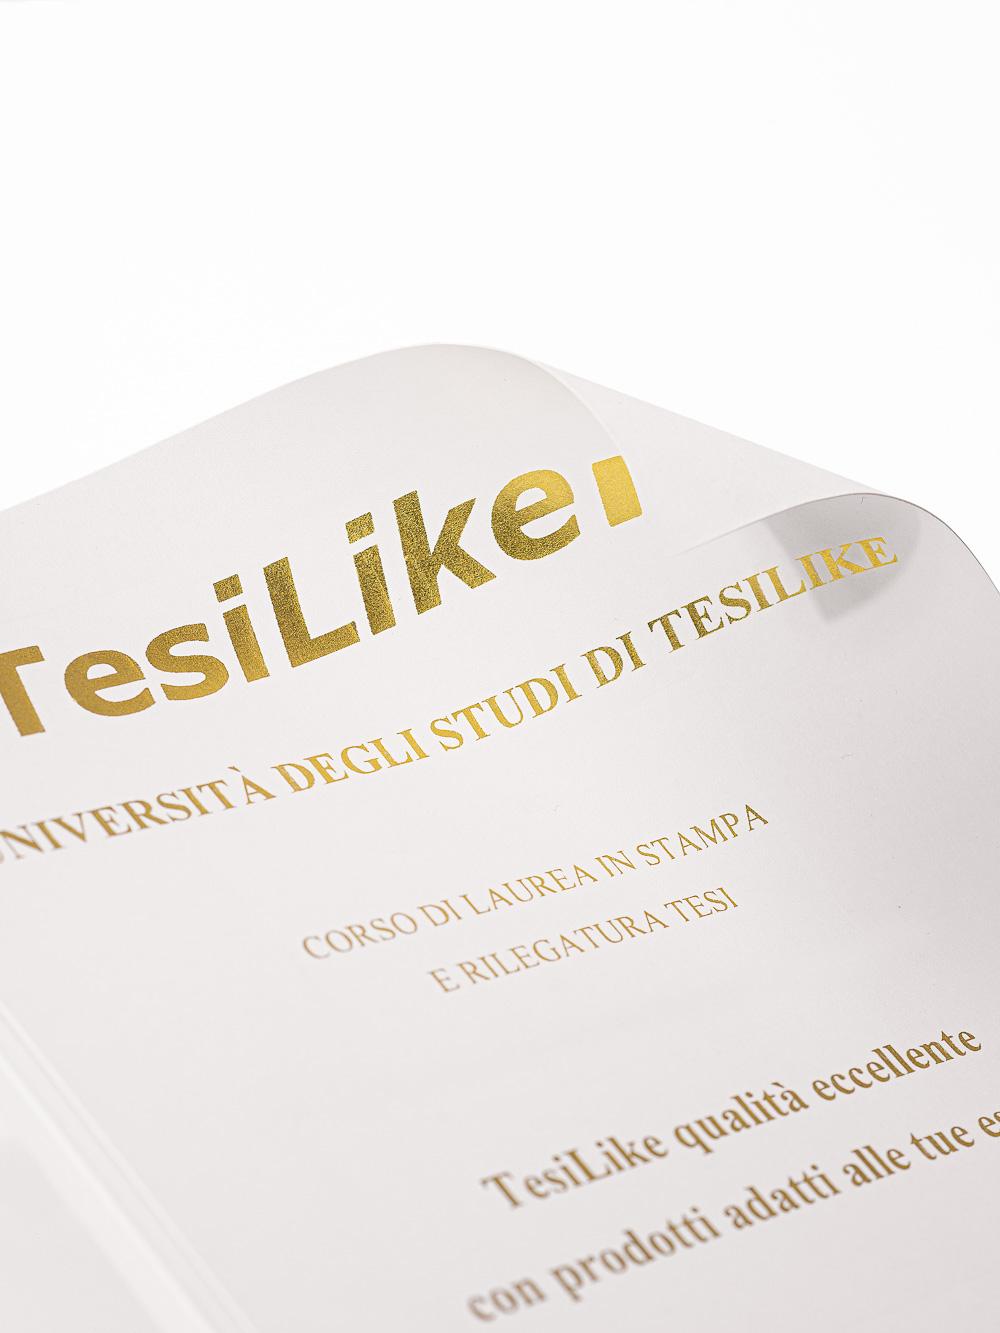 copertina-tesi-flessibile-bianca-frontespizio-oro-dettaglio2-tesilike